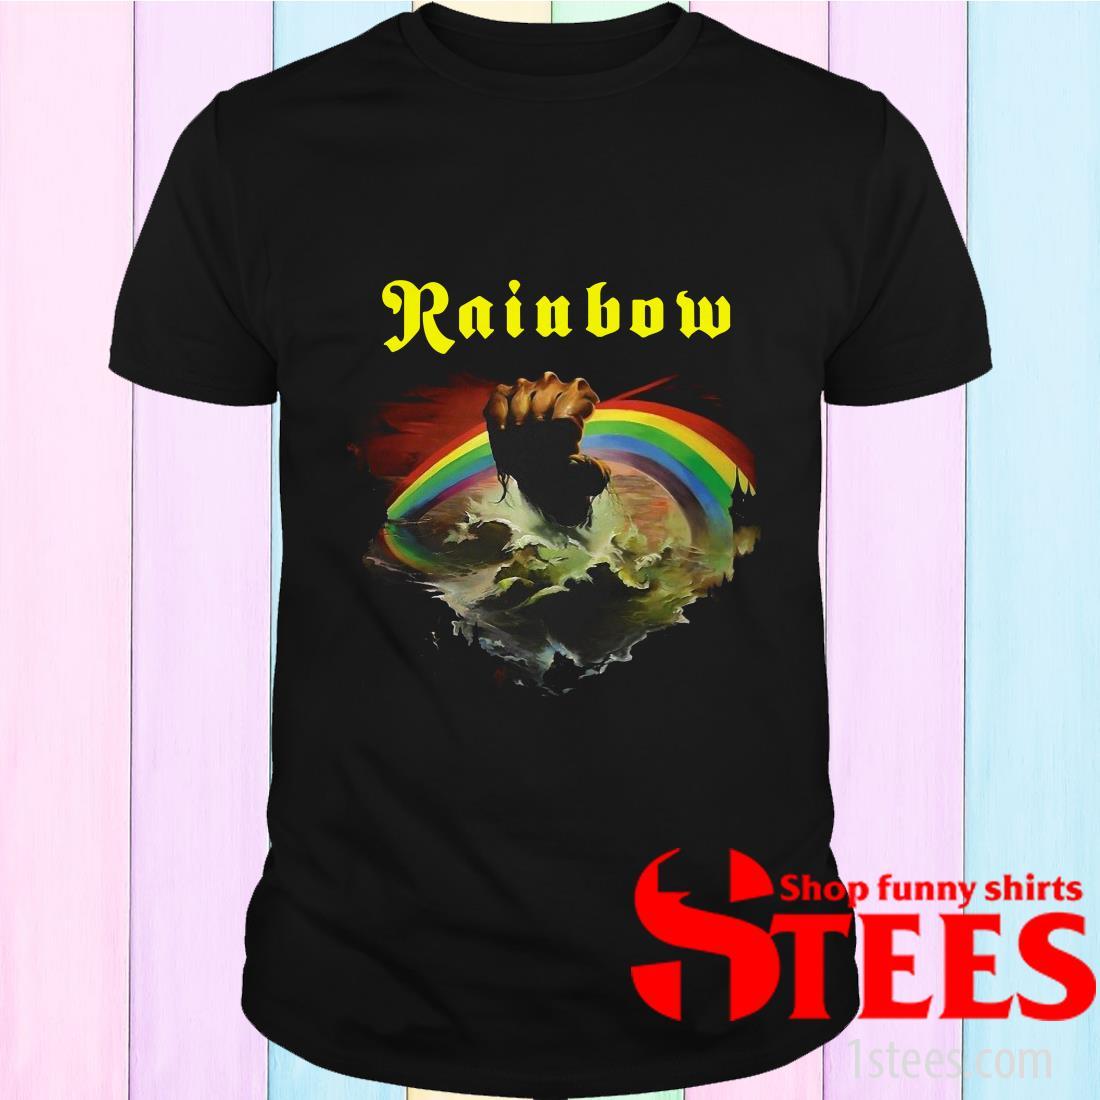 Rising Rainbow Version T-Shirt